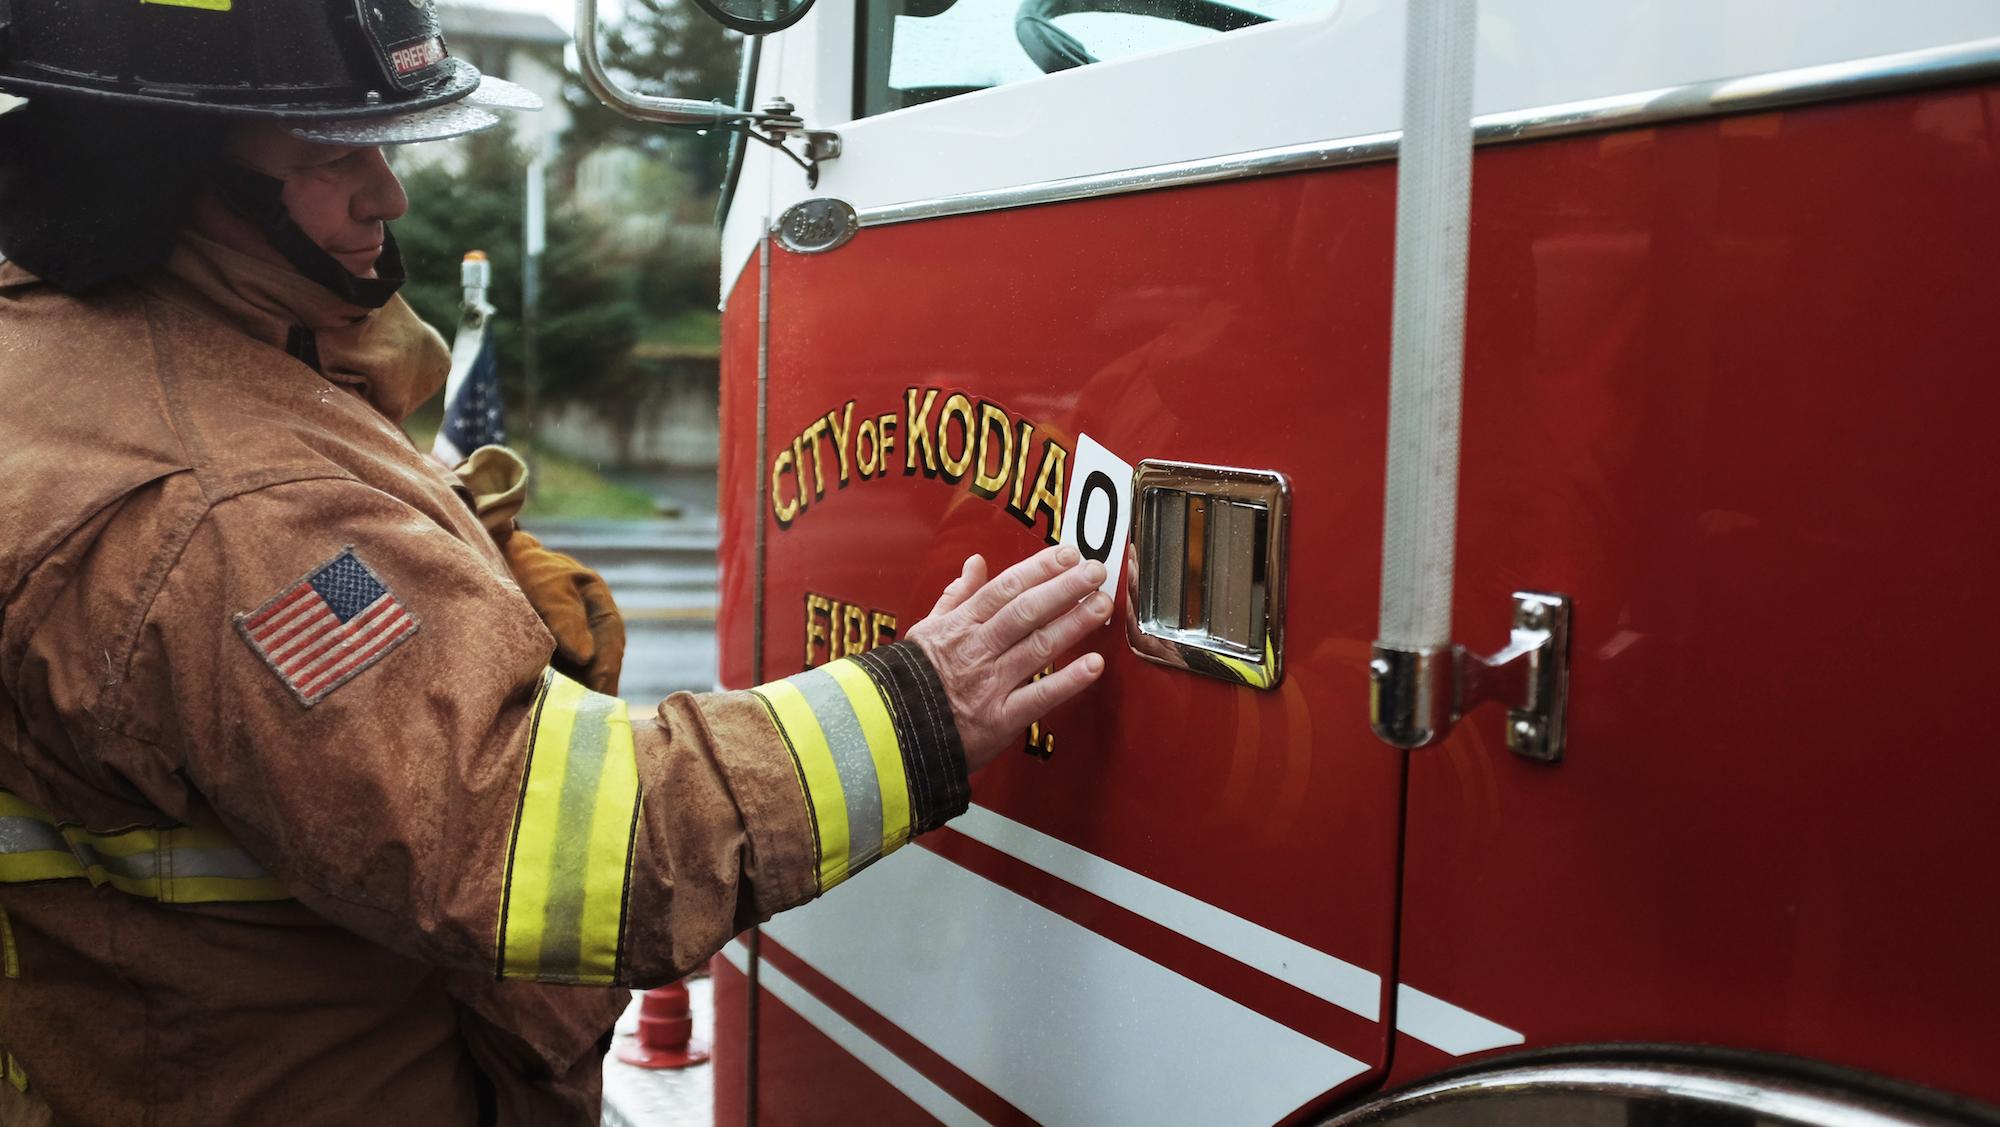 Skoda Kodiaq essai auto pompiers ville de Kodiak signification du nom